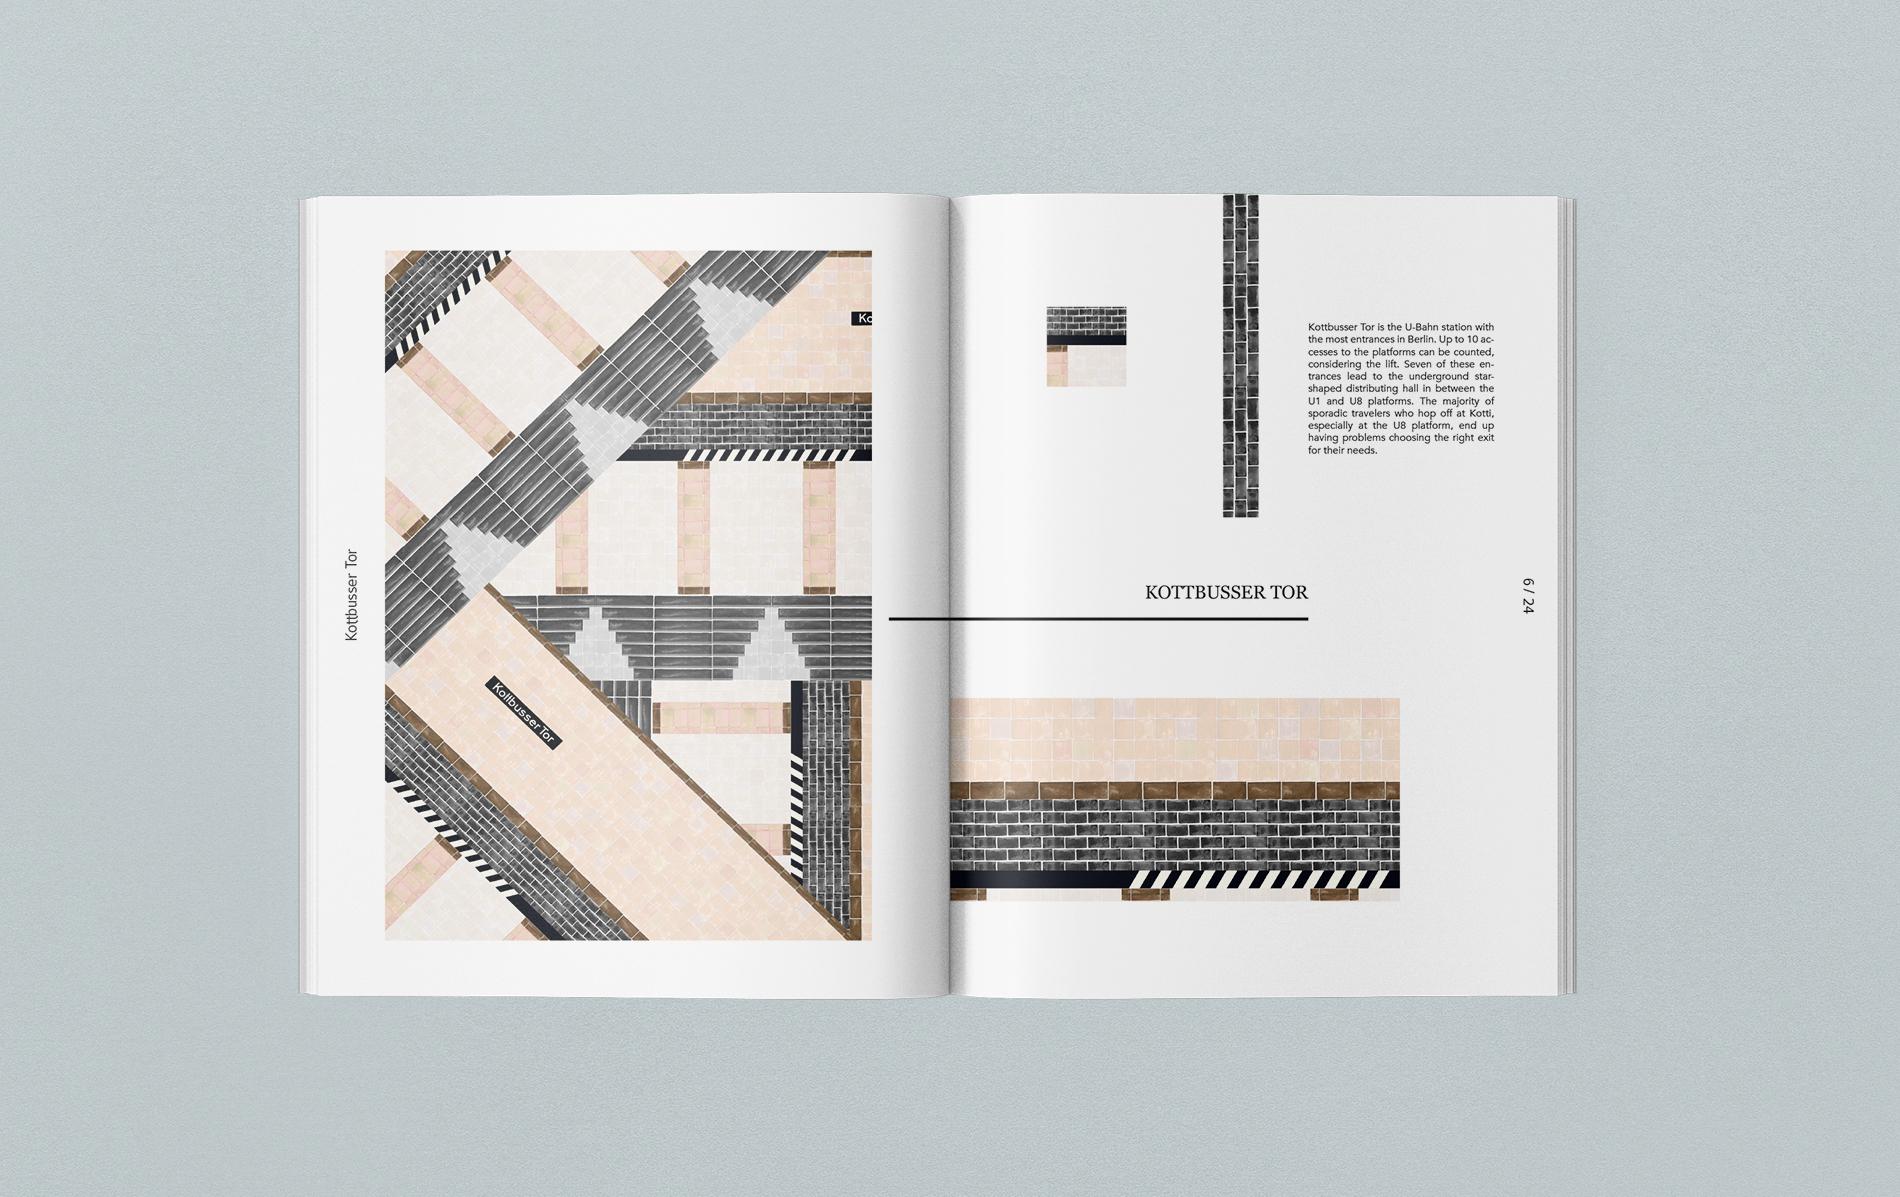 magazine_insides_pages mockup 3.jpg